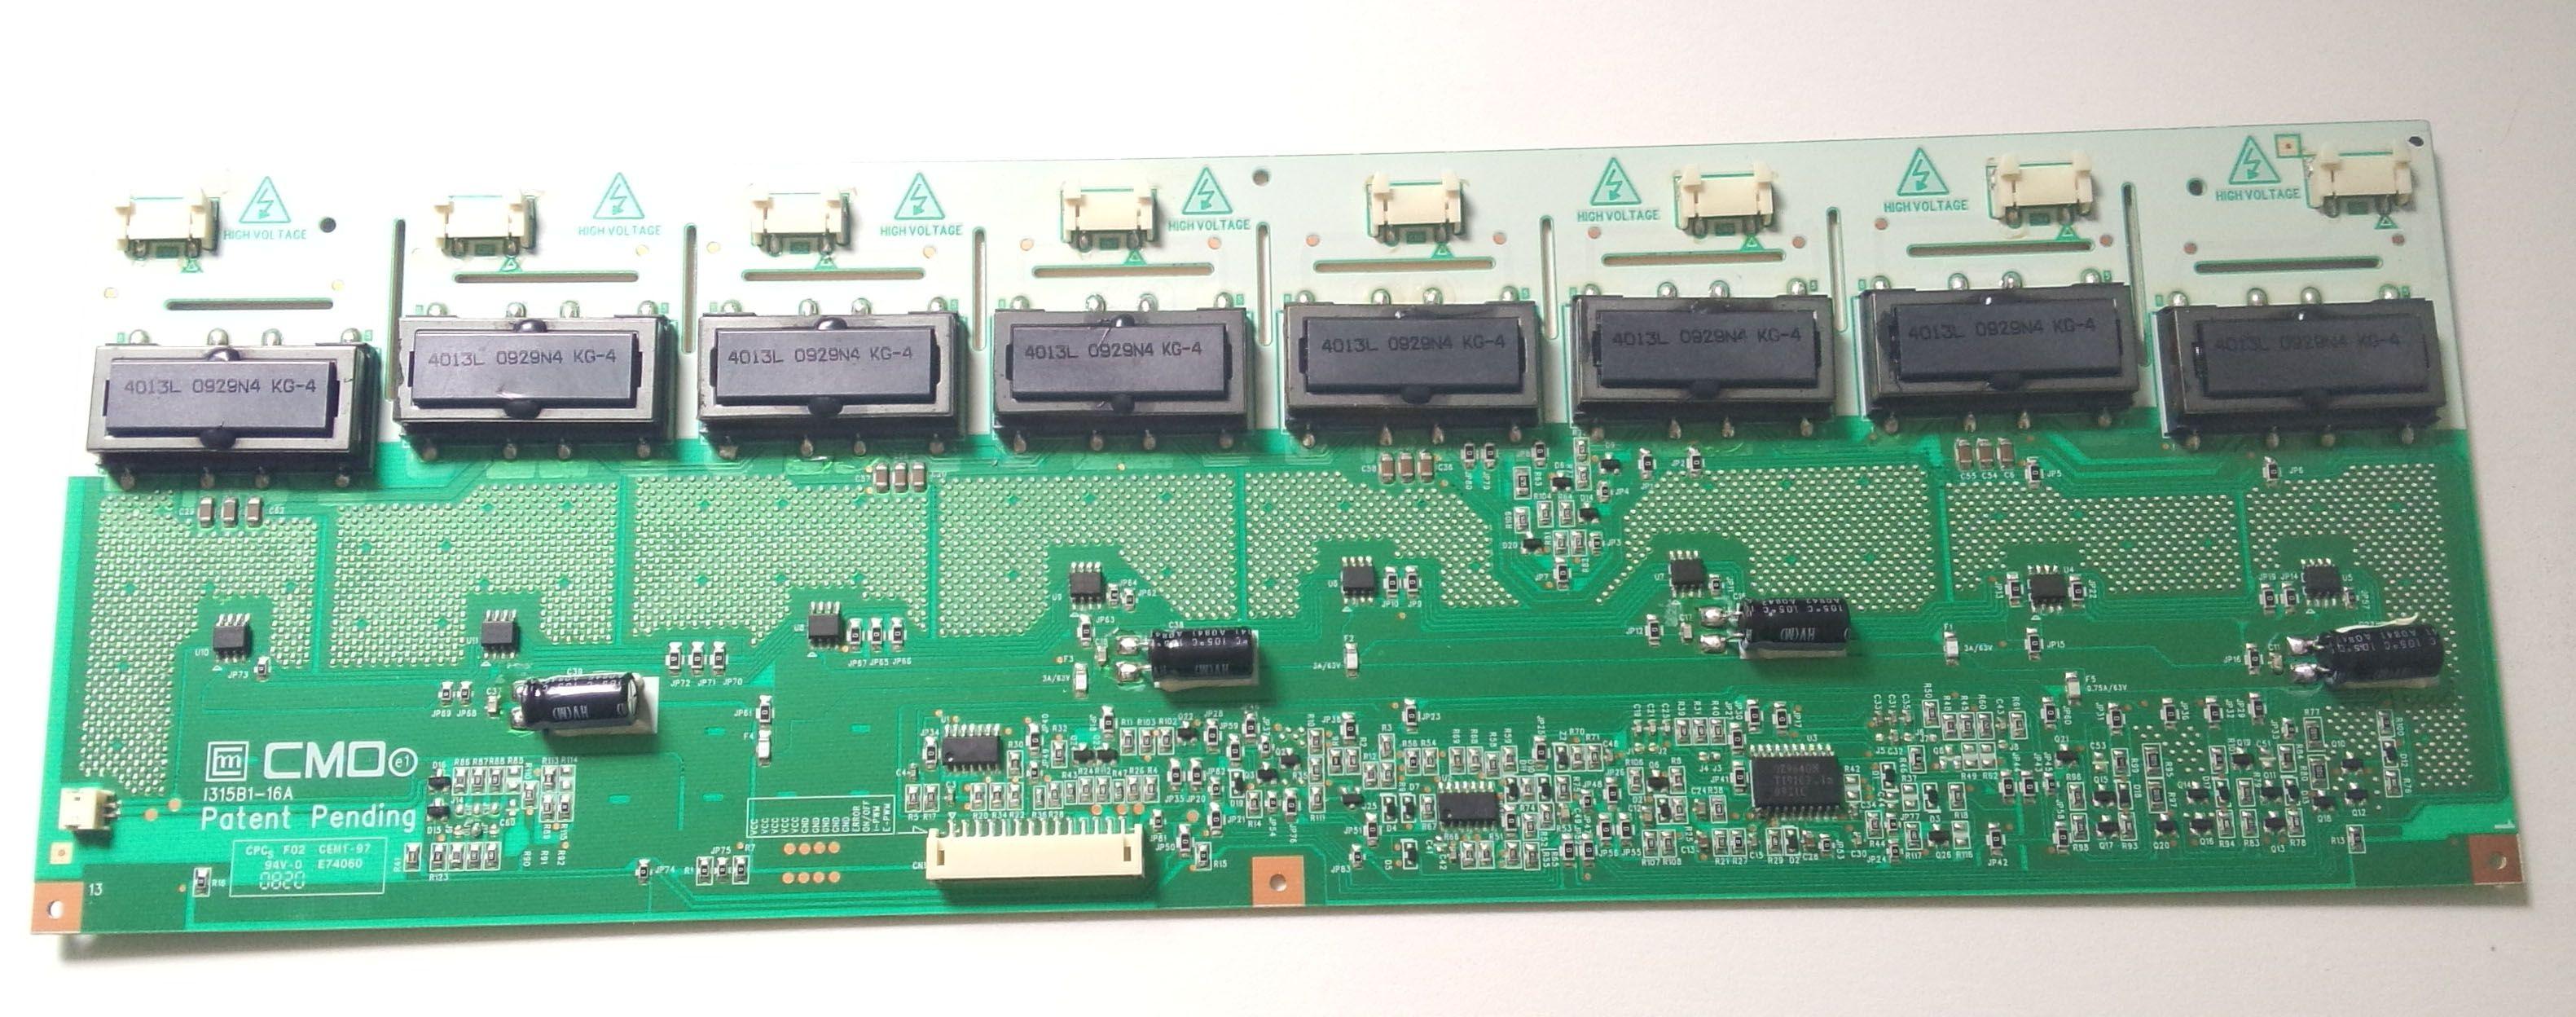 Free Shipping 100% Tested Work Used Original LCD Backlight Inverter Board  TV Board Unit I315B1-16A 1315B1-16A Screen V315B1-L01